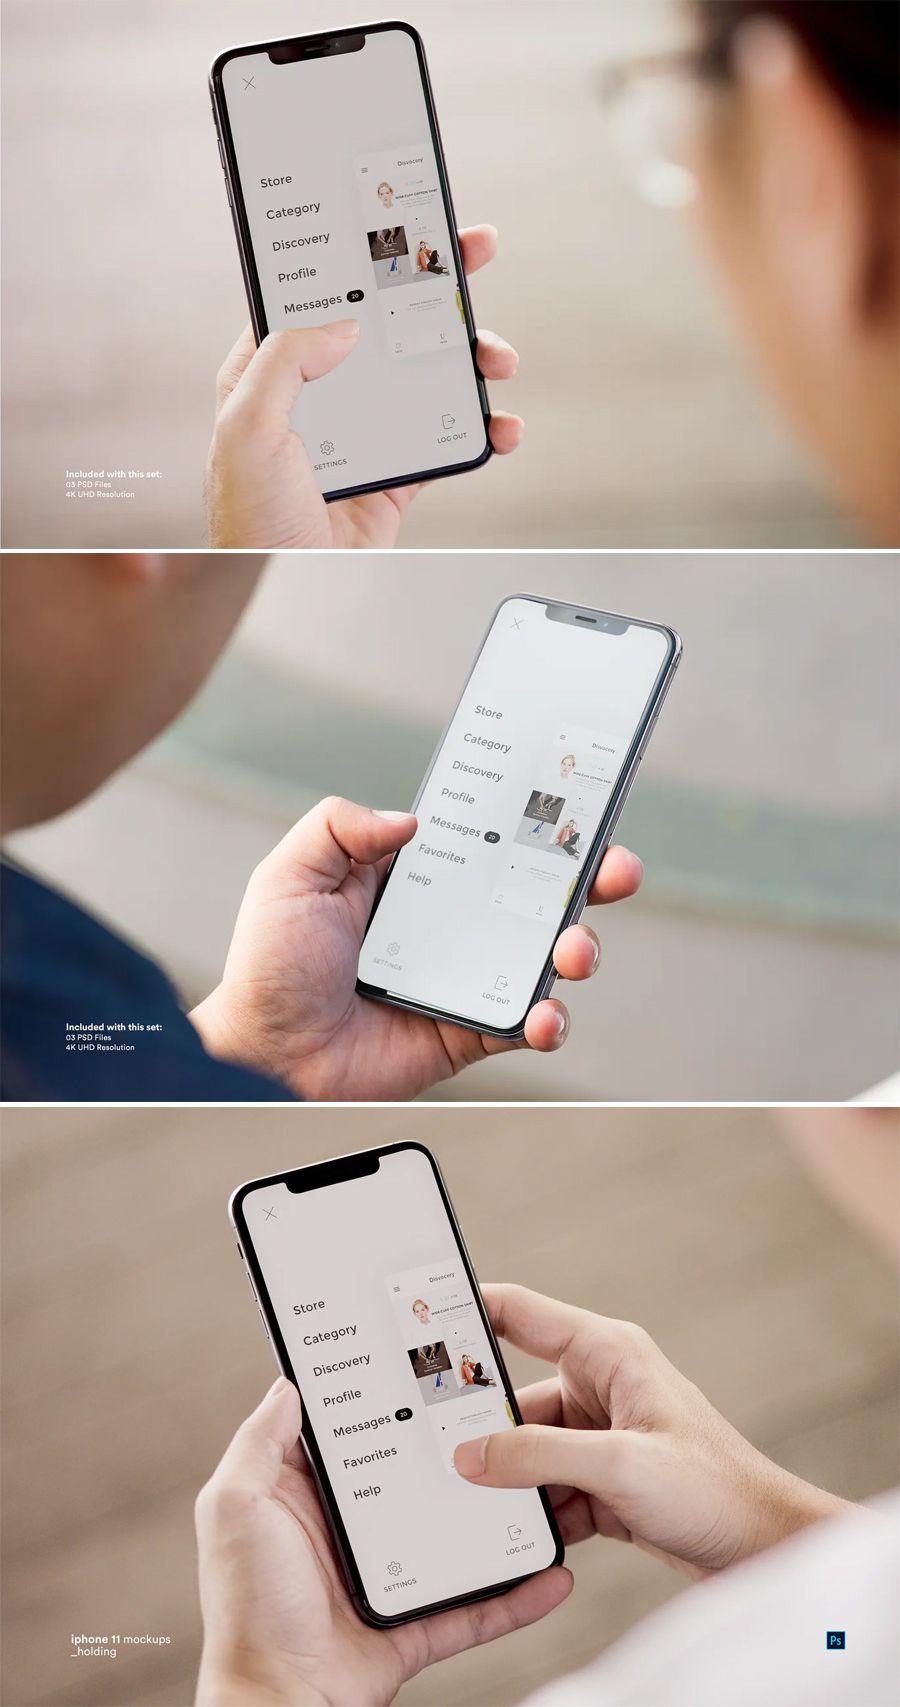 Iphone 11 Mockup Psd In 2020